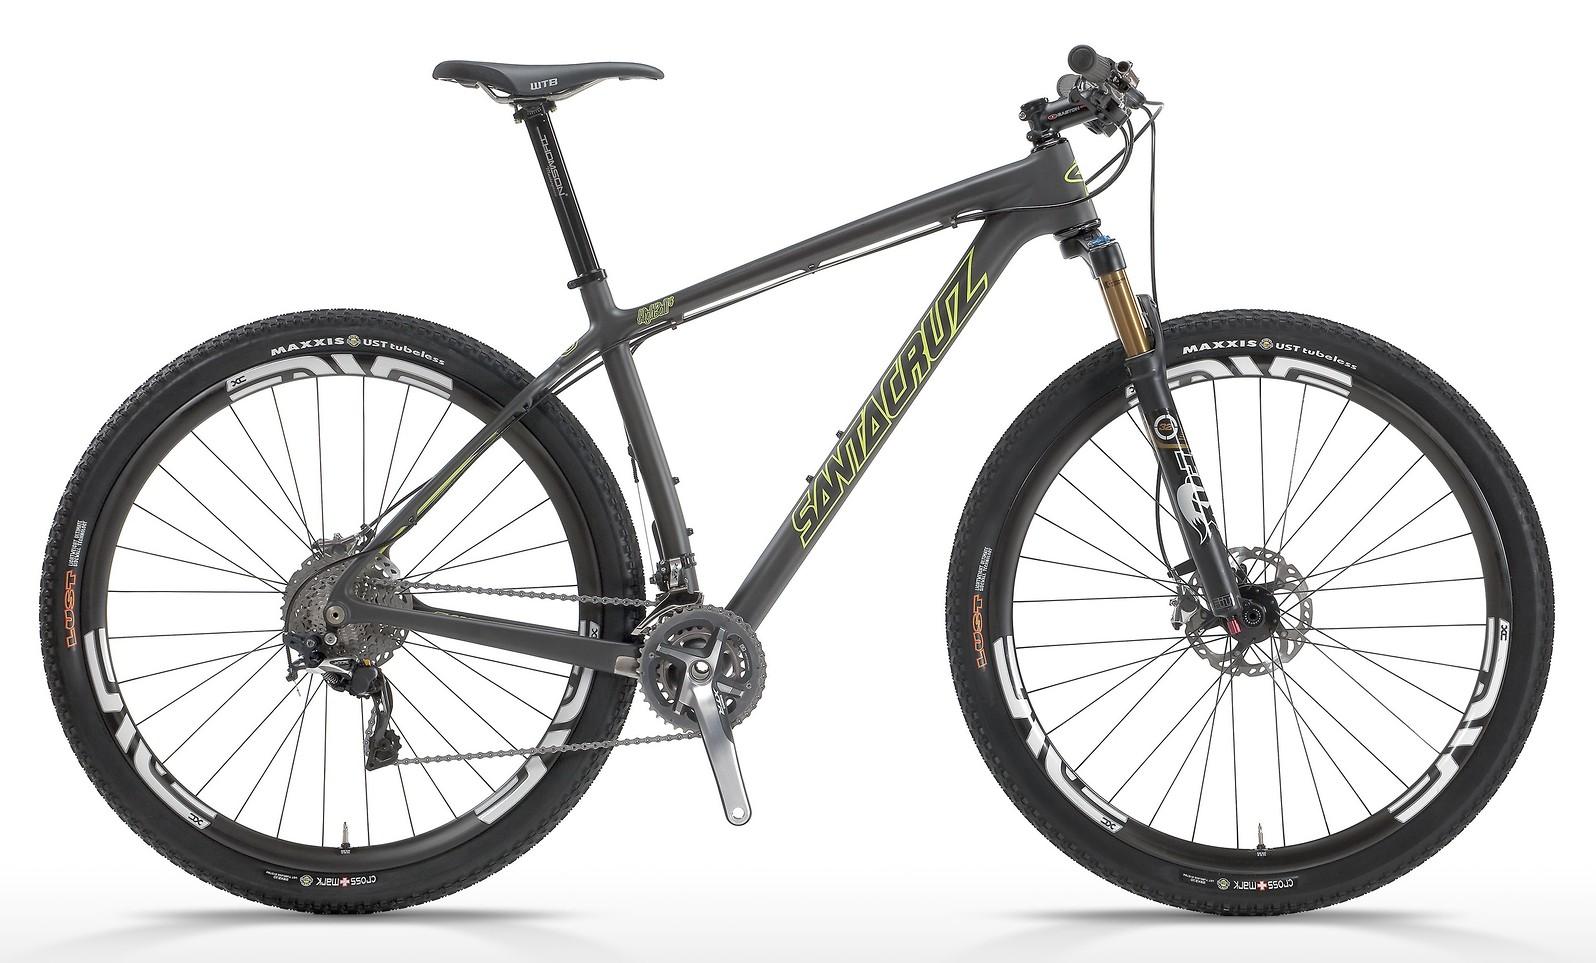 2014 Santa Cruz Highball Carbon SPX XC 29 Bike 2013 HIGHBALL Ccatalogflat